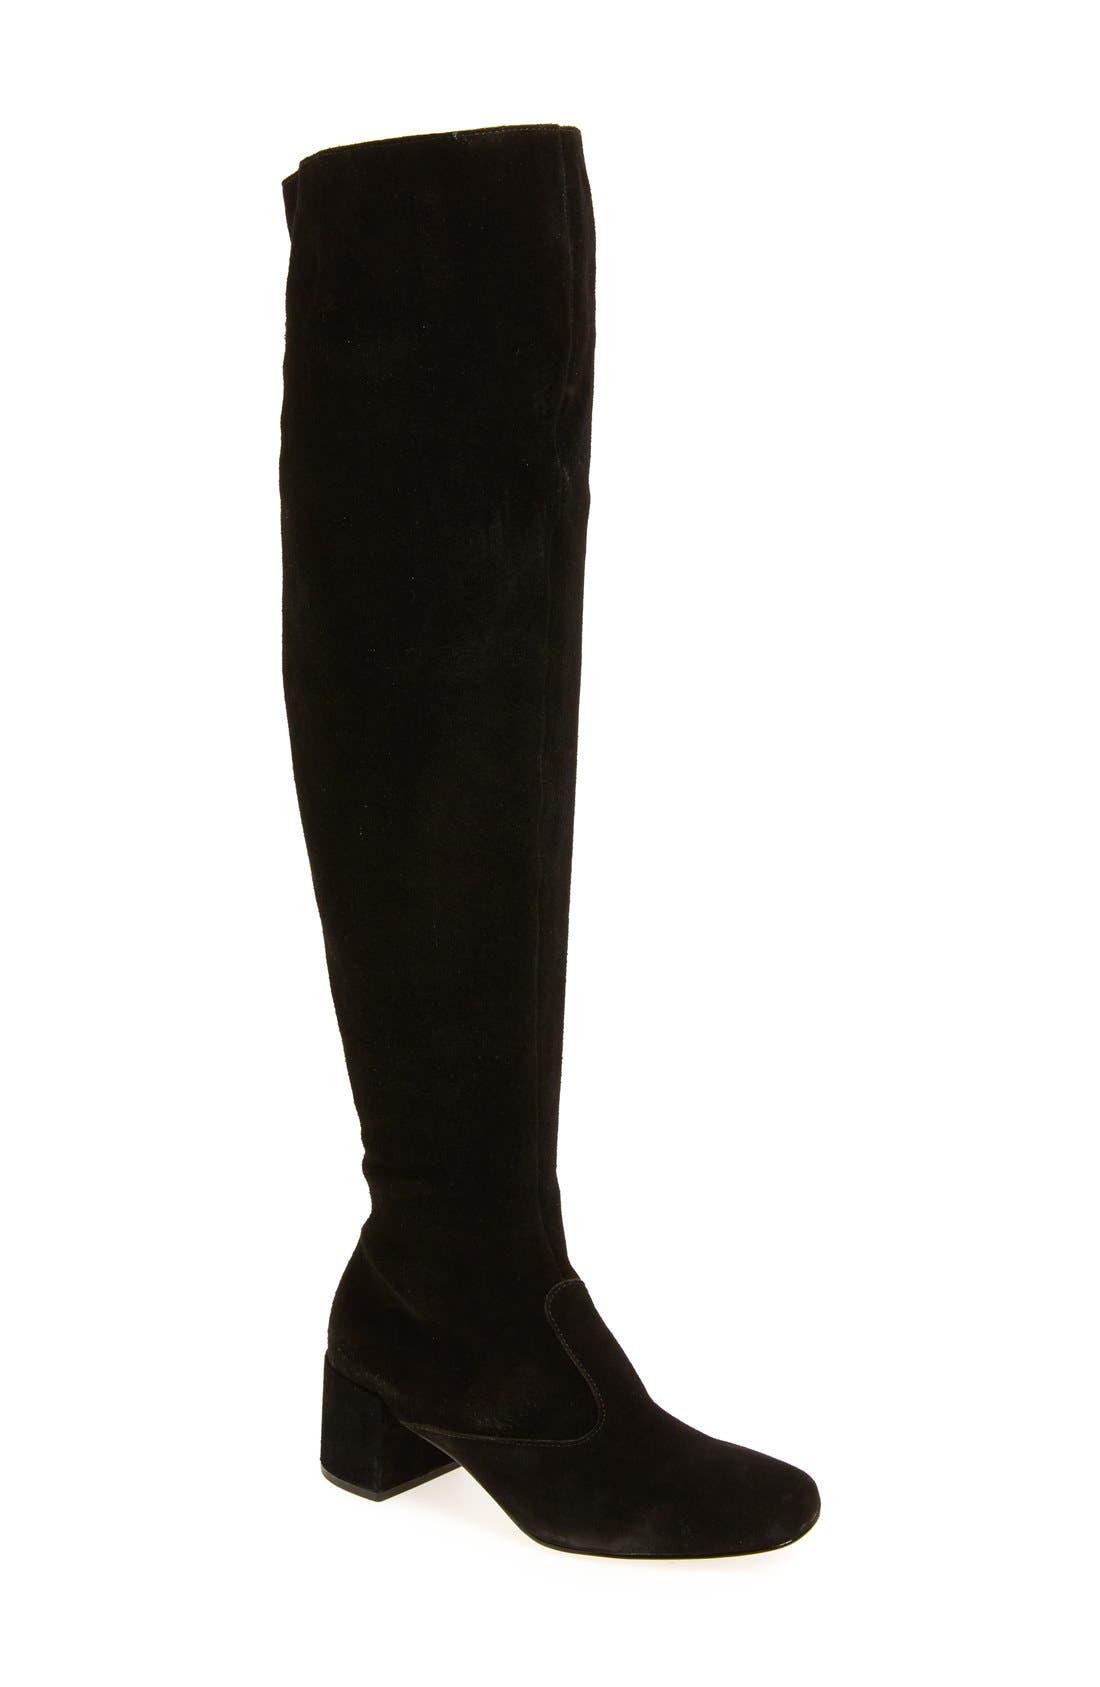 Alternate Image 1 Selected - Matisse Reginald Over the Knee Boot (Women)